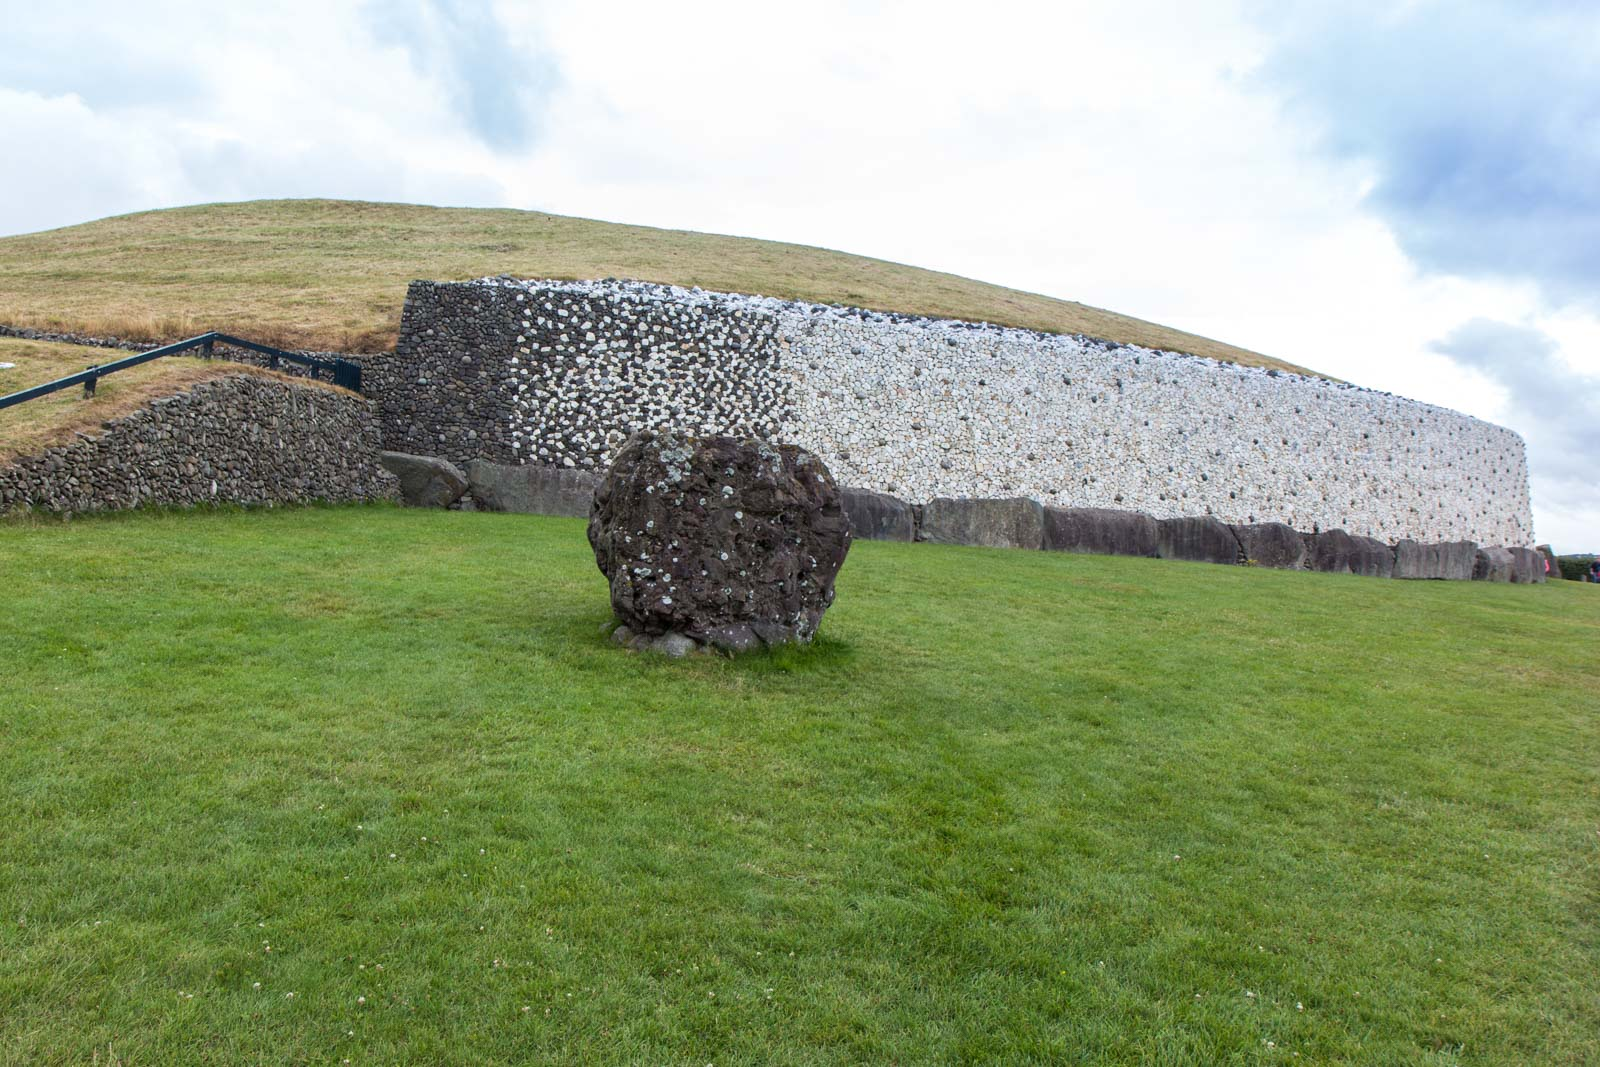 Newgrange tour, Bru na Boinne, Ireland